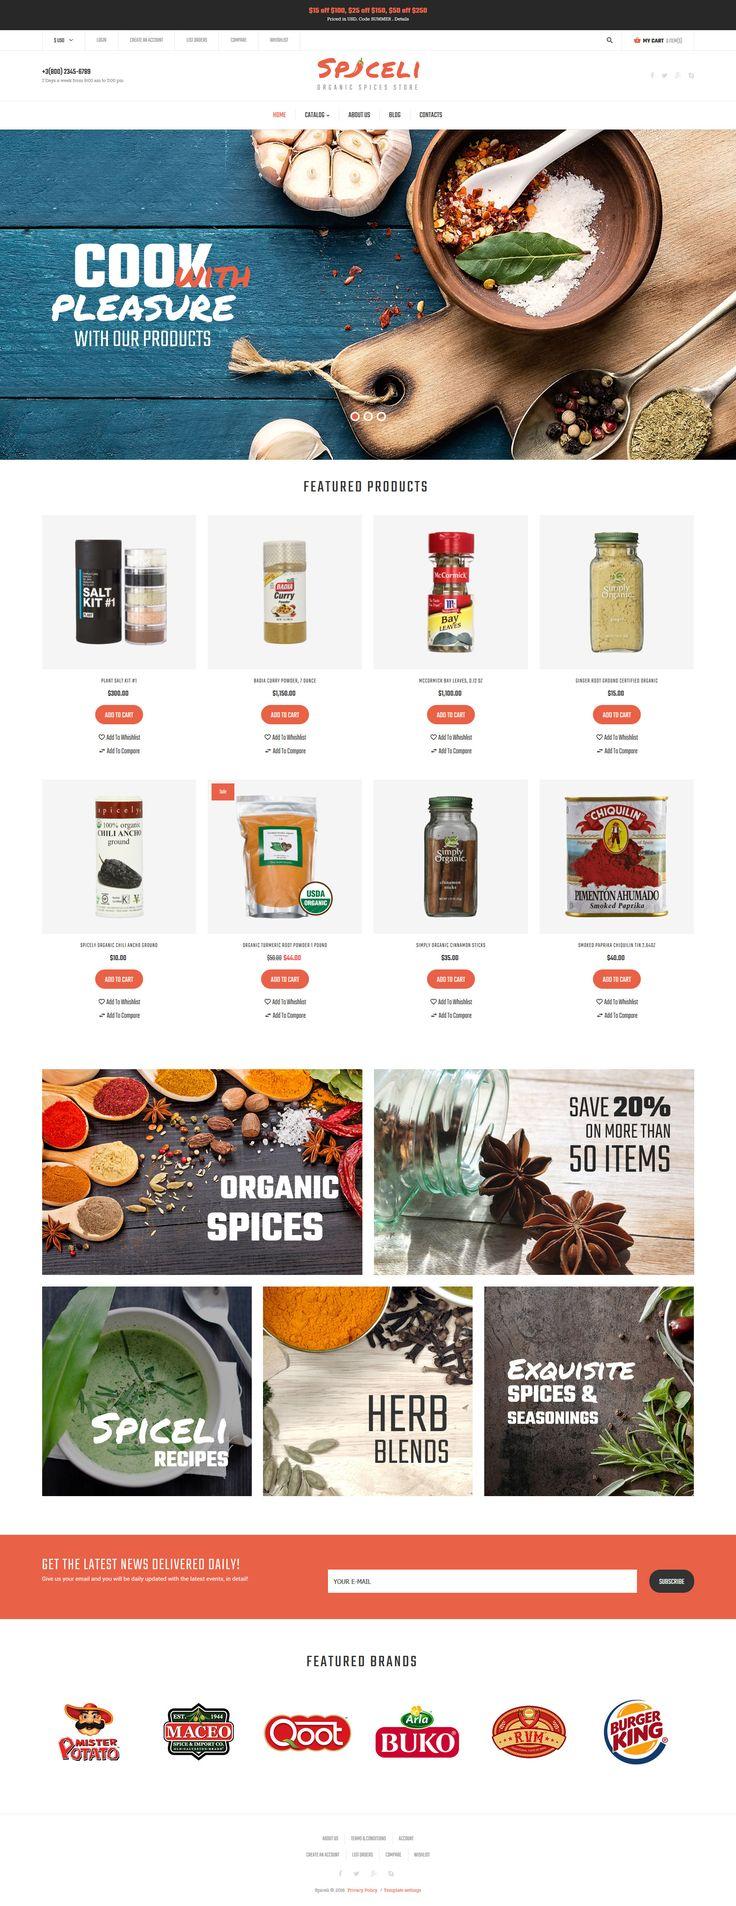 Spice Shop Responsive VirtueMart Template - http://www.templatemonster.com/virtuemart-templates/spice-shop-responsive-virtuemart-template-61356.html